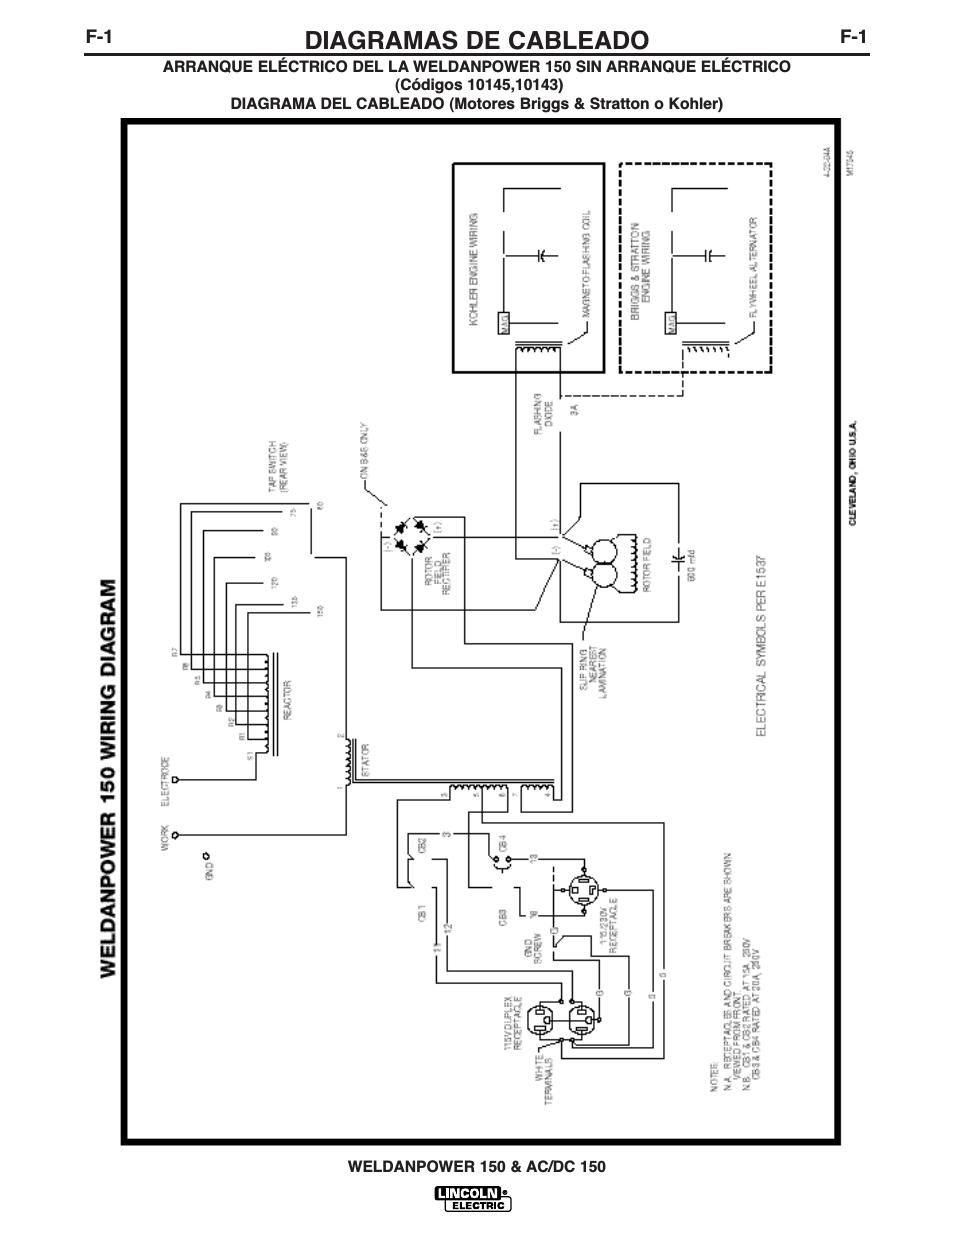 lincoln electric ac 225 wiring diagram - wiring diagrams lease-metal -  lease-metal.alcuoredeldiabete.it  al cuore del diabete